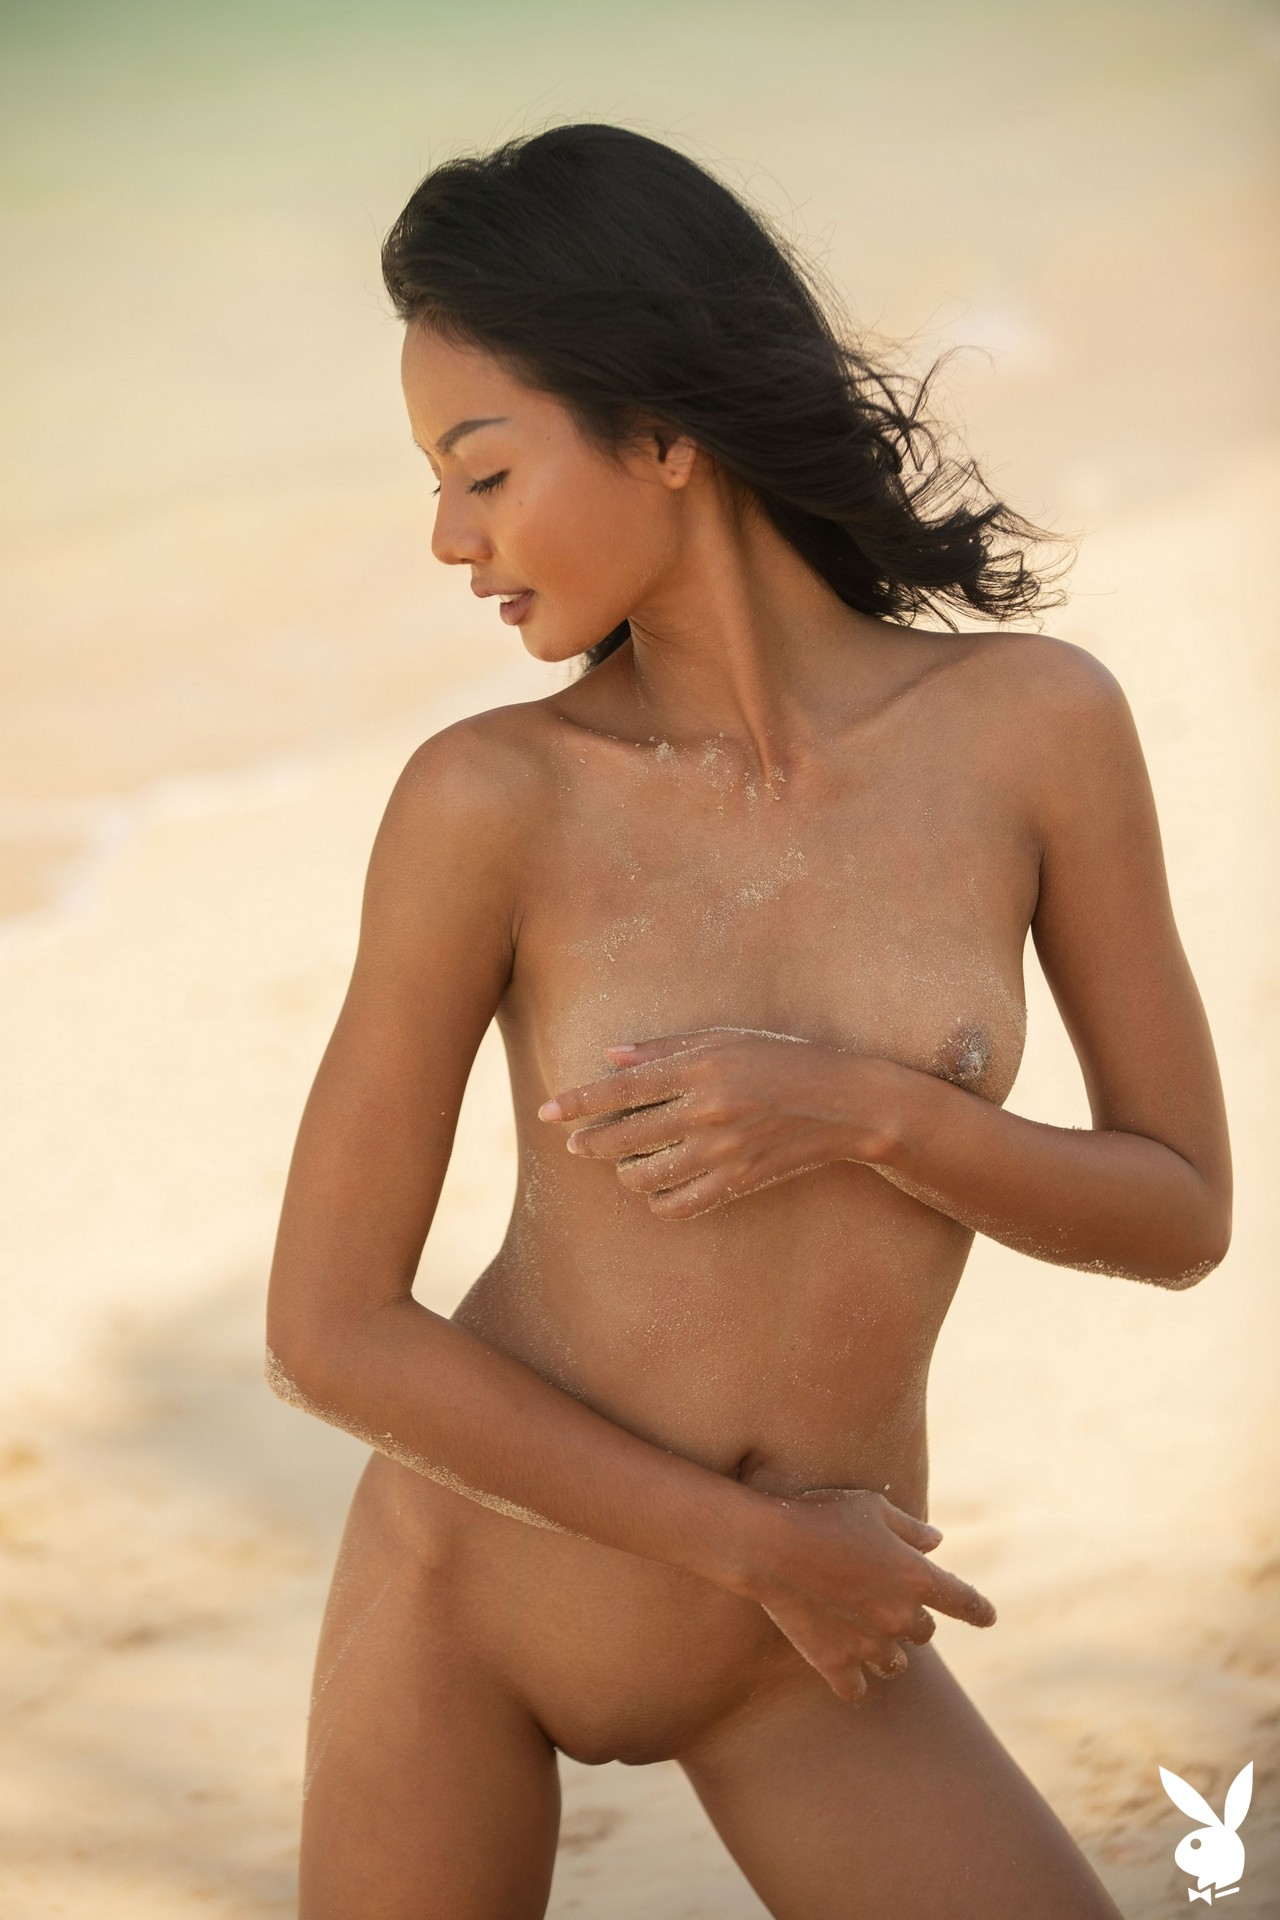 Magen Hana In Island Mentality Playboy Plus (17)